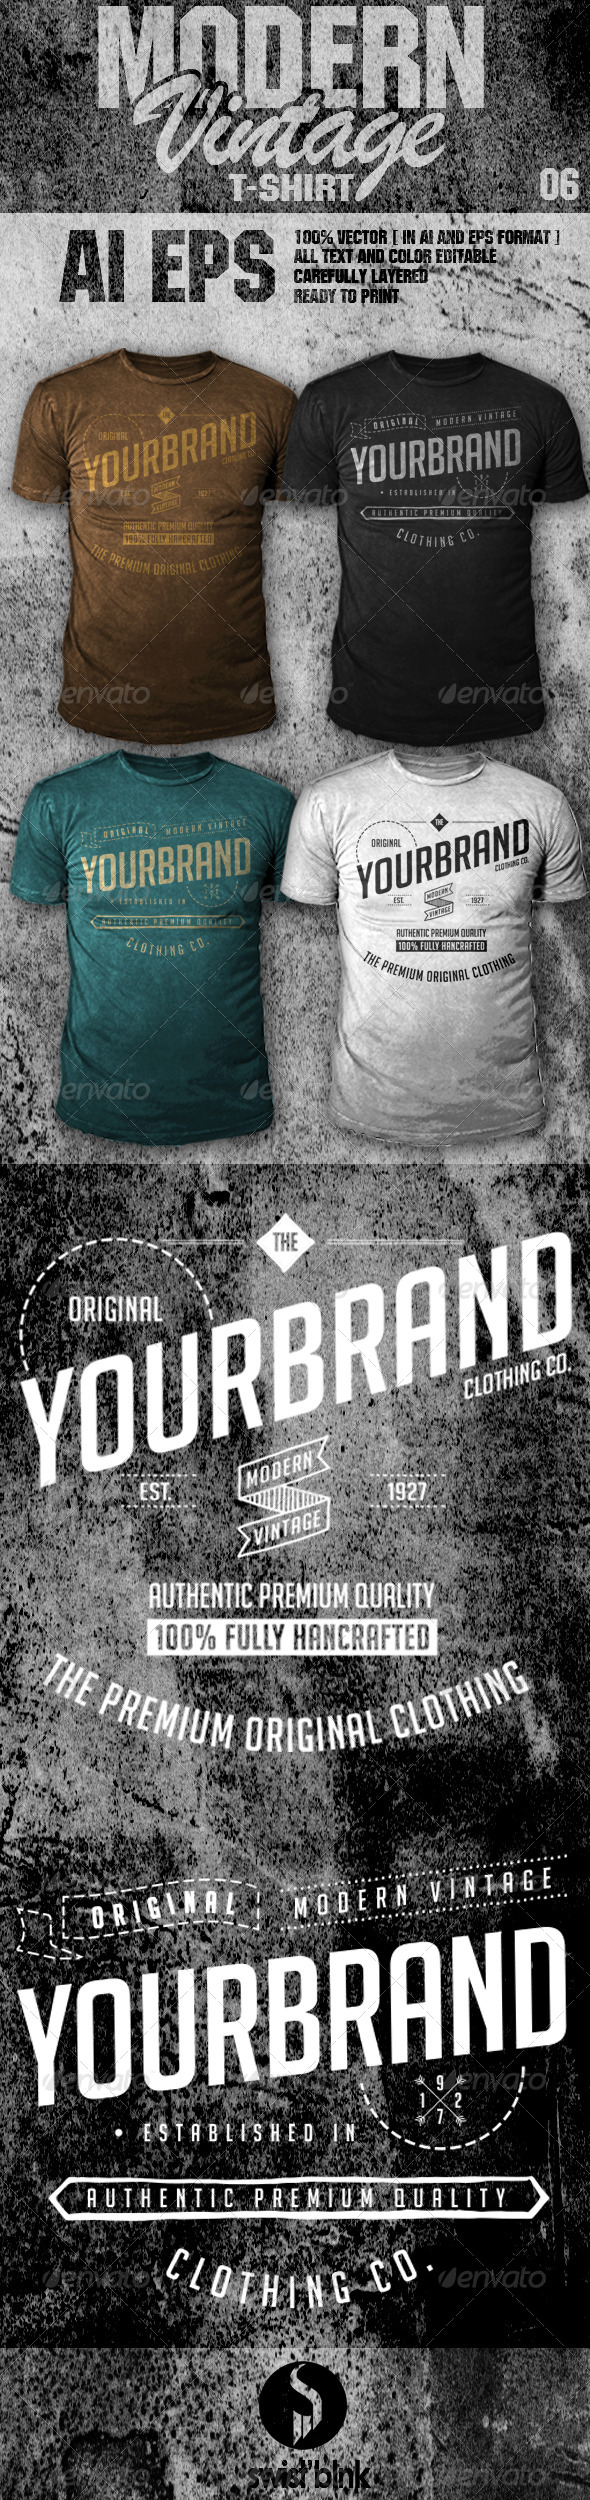 GraphicRiver Modern Vintage T-Shirt 06 6984410